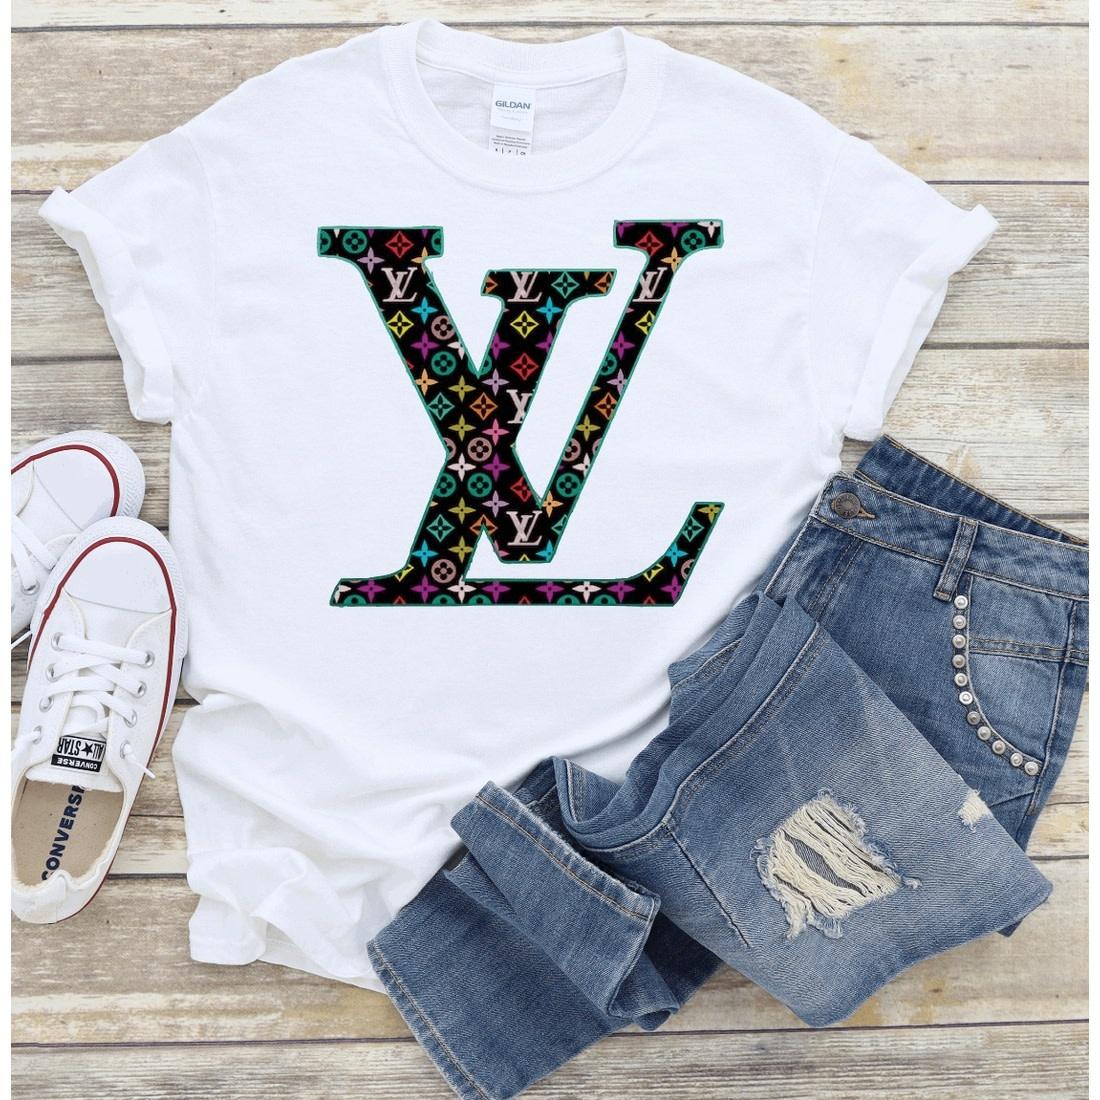 LV Tee Shirt